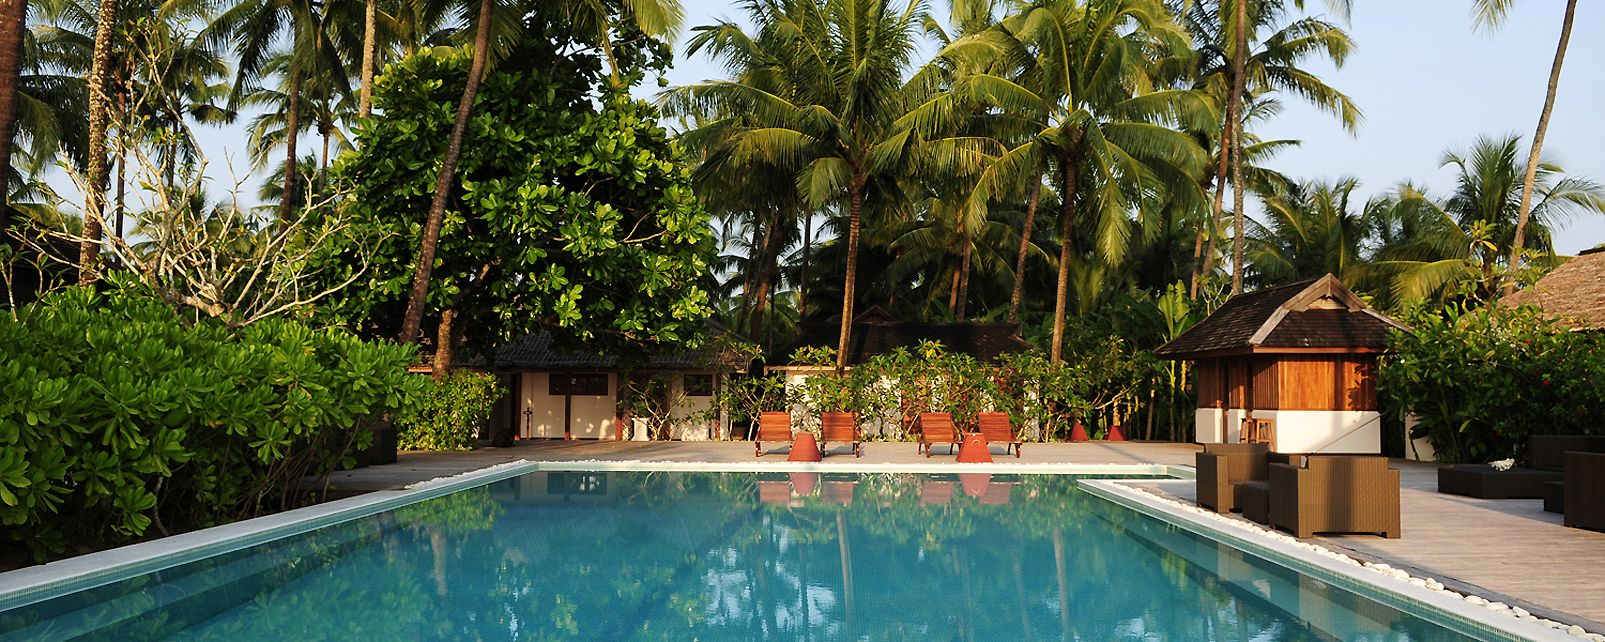 Hôtel Amara Ocean Resort